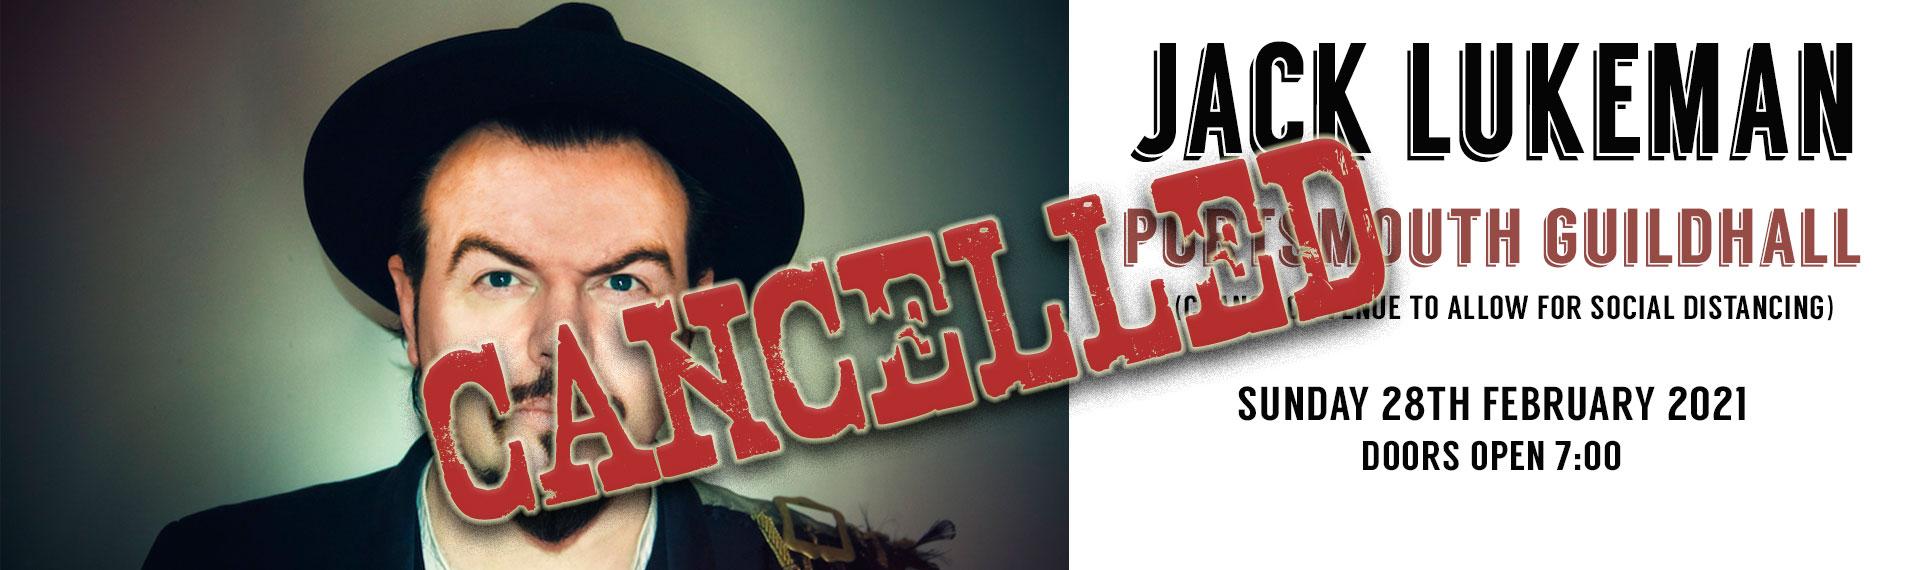 jack-lukeman-banner5-cancelled